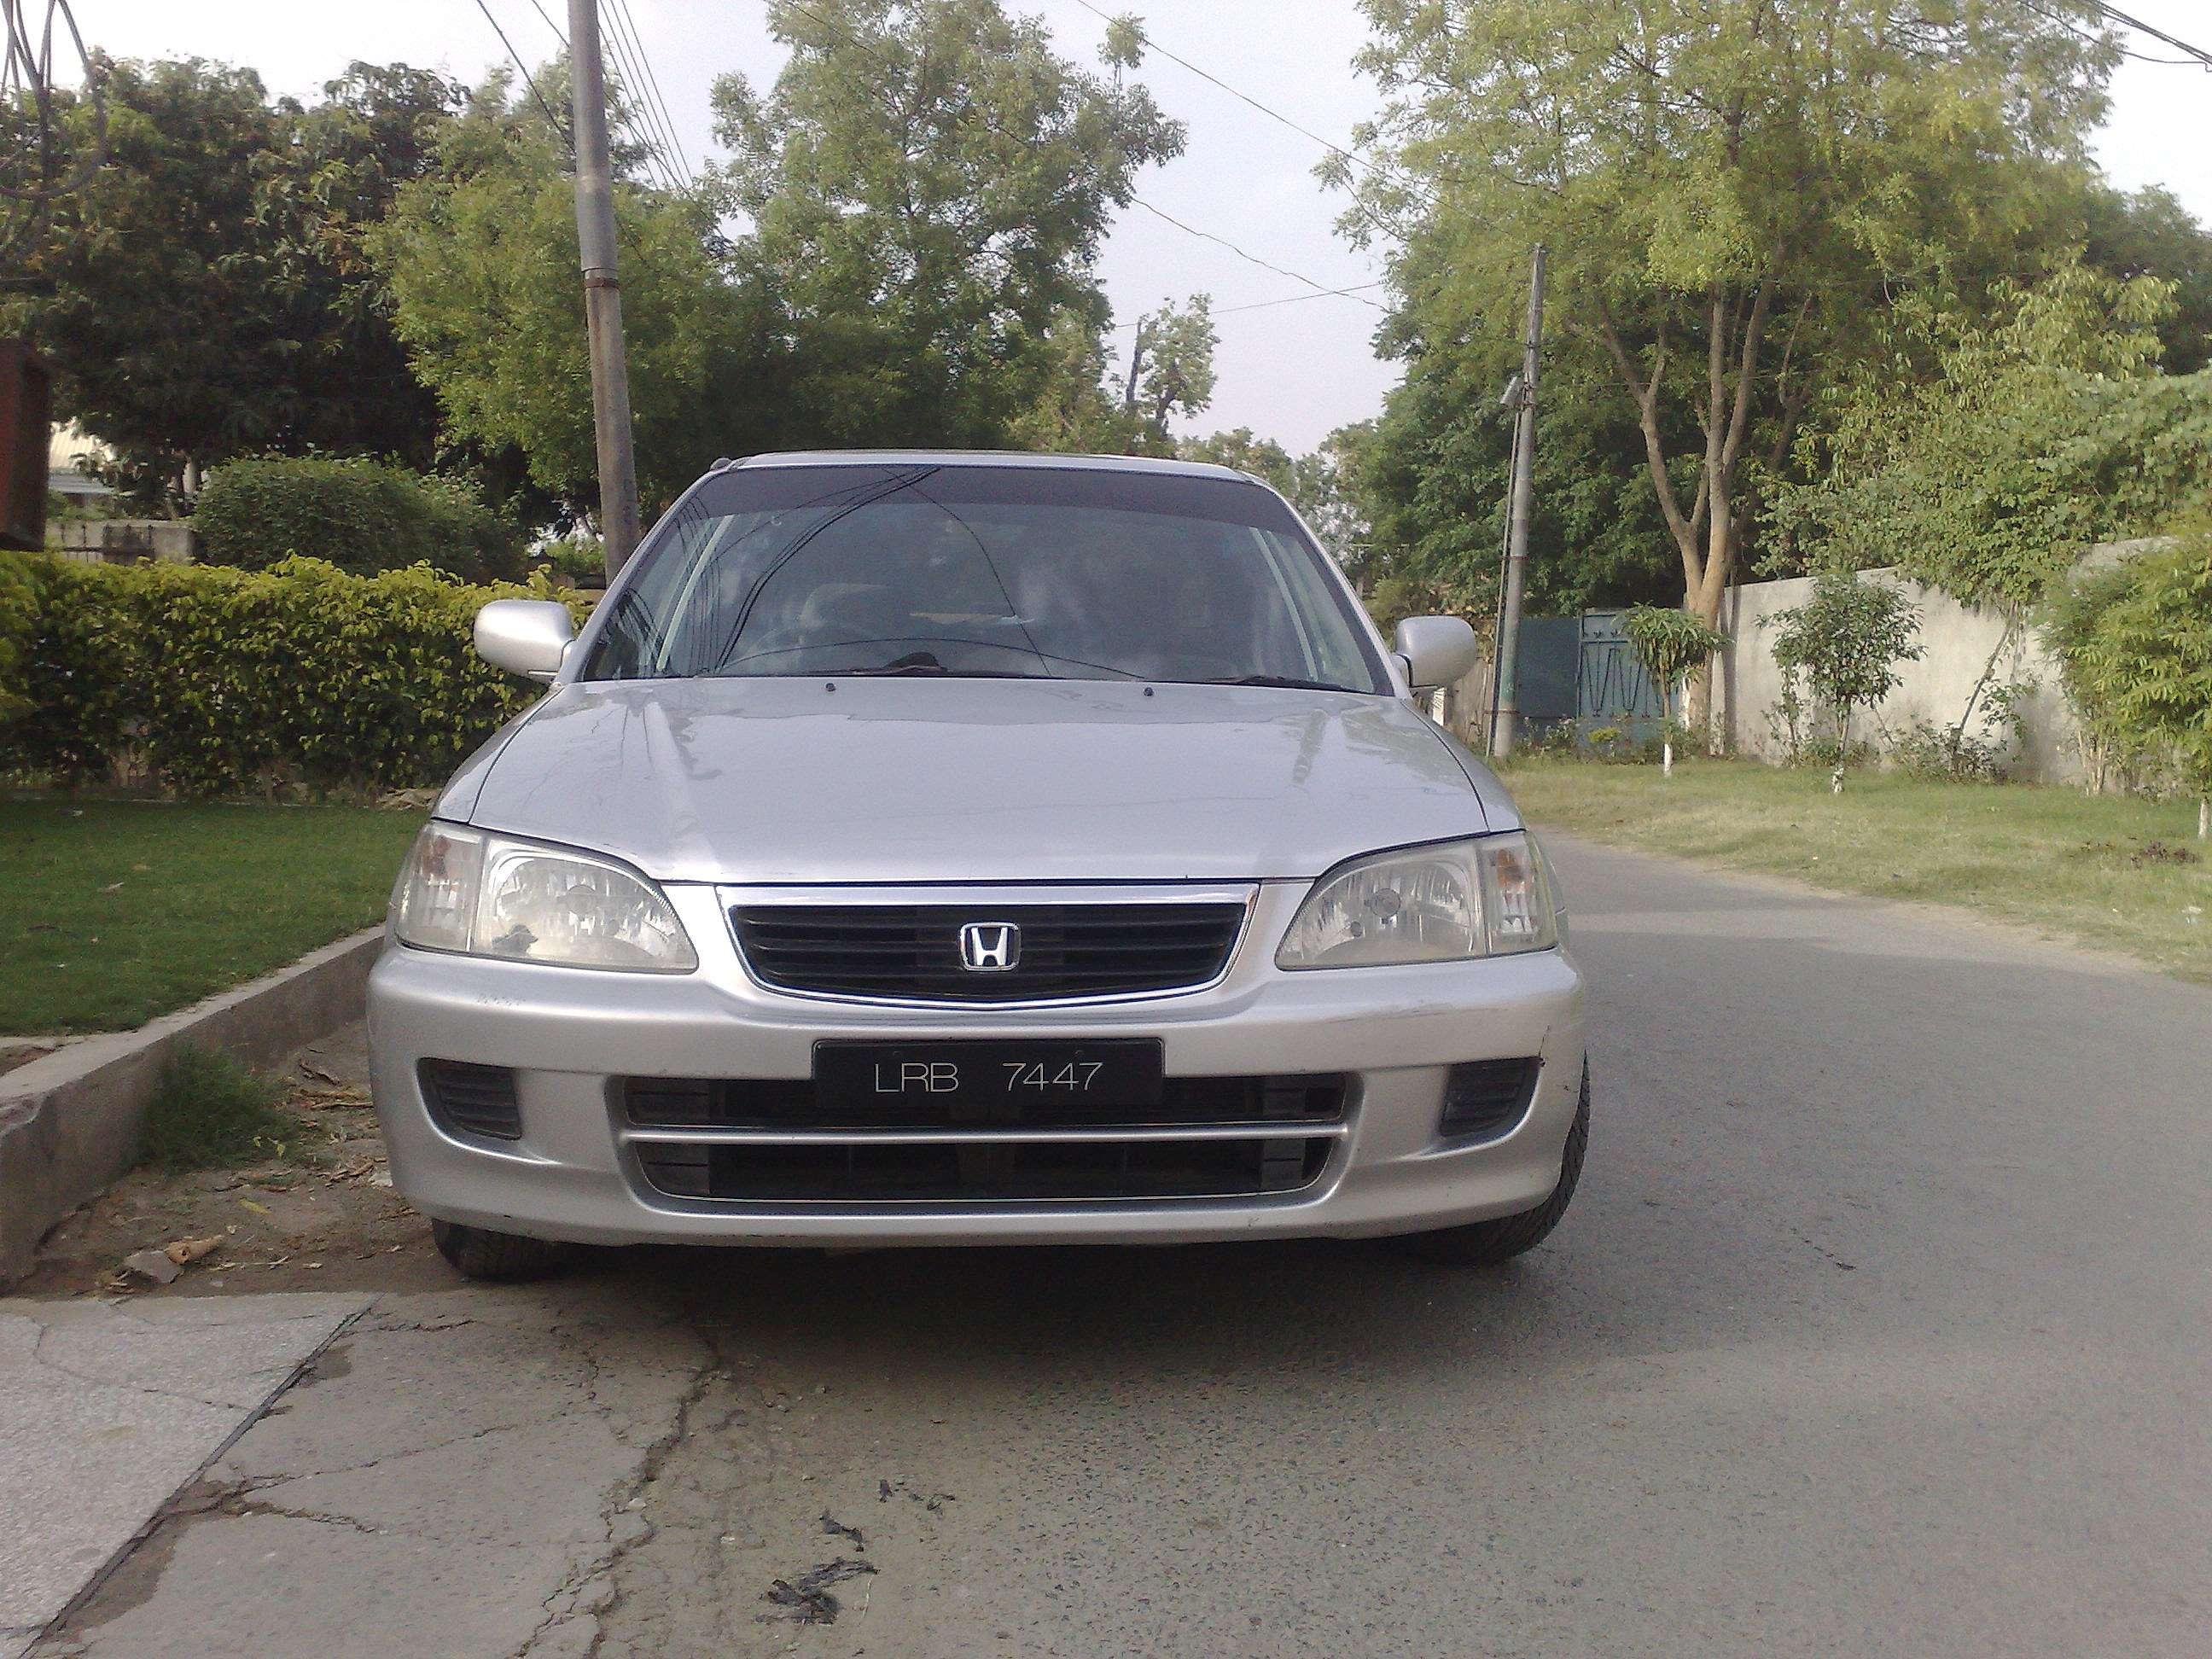 Honda City 2002 of affansaigol - Member Ride 9445   PakWheels